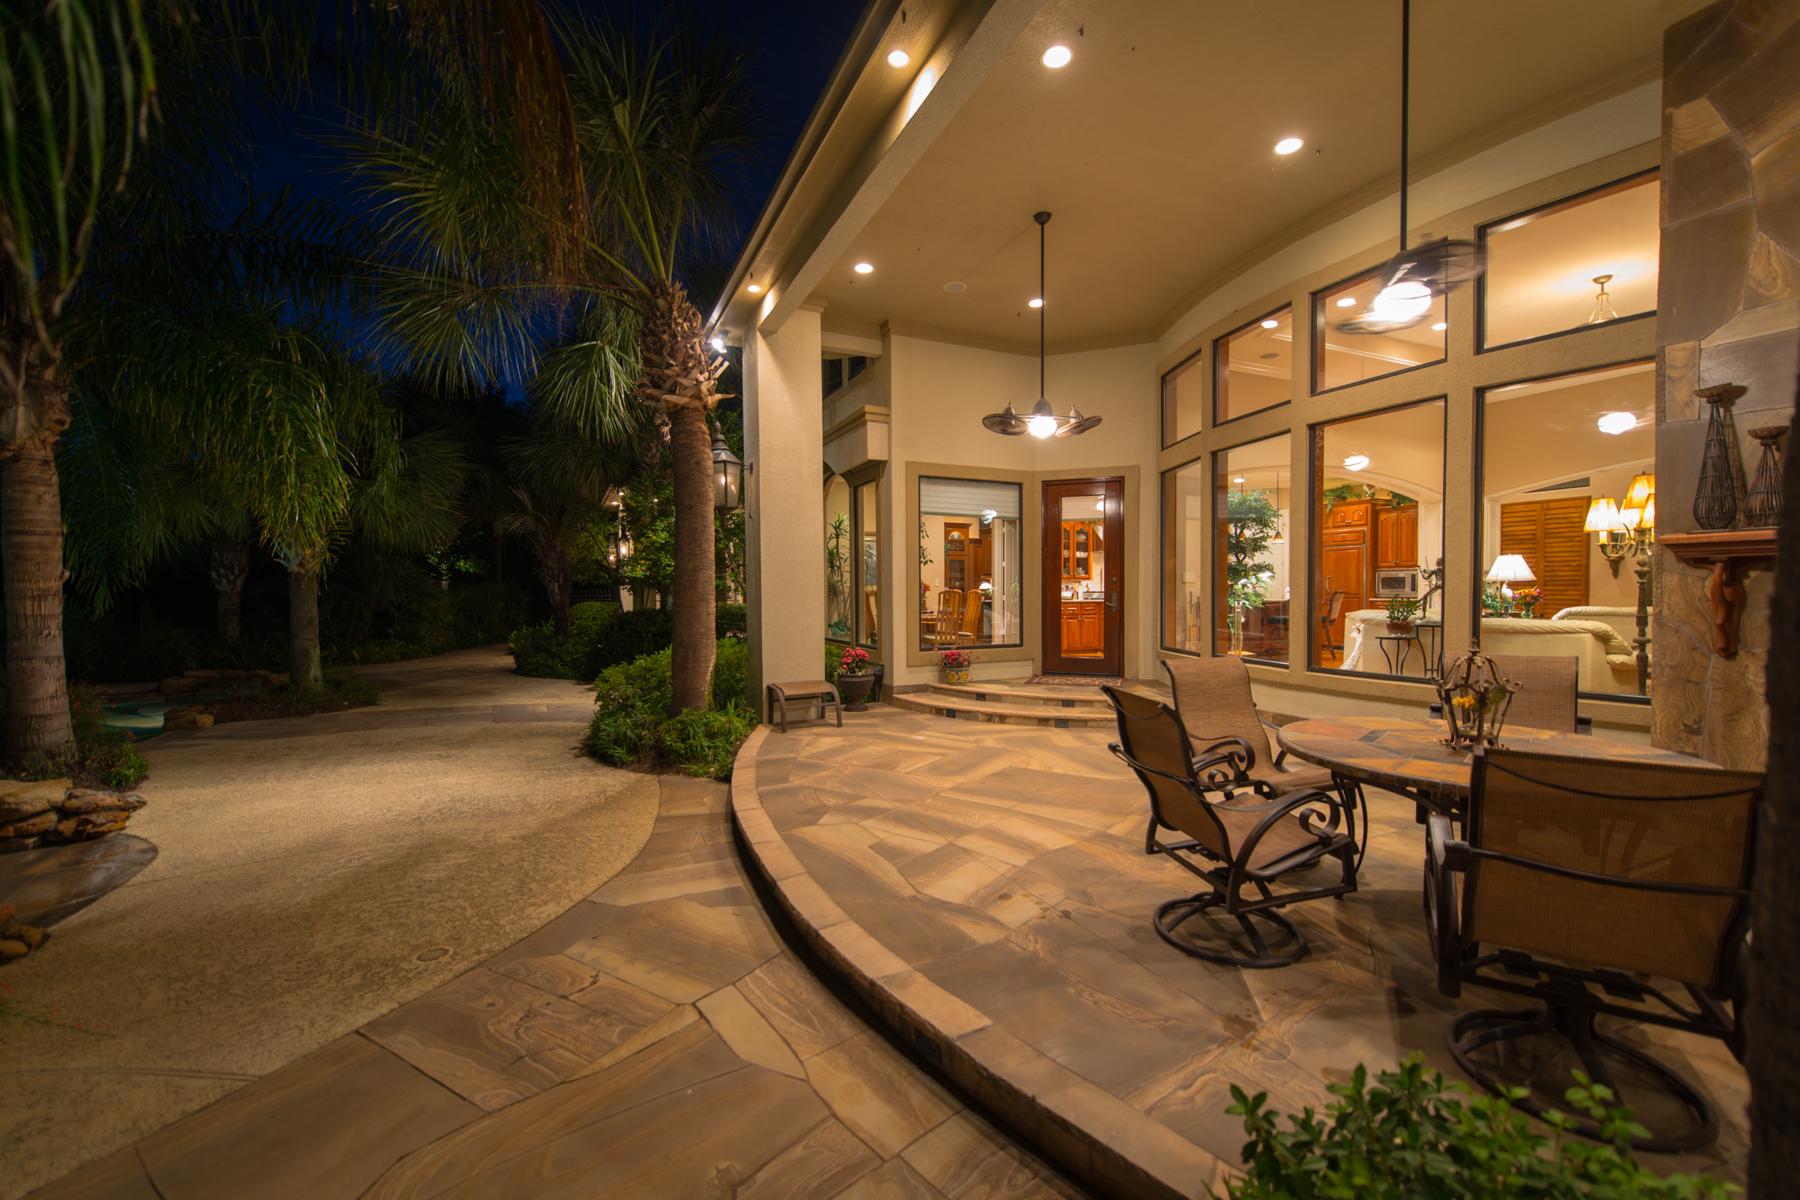 Additional photo for property listing at 37307 Diamond Oaks Dr  Magnolia, Texas 77355 Estados Unidos